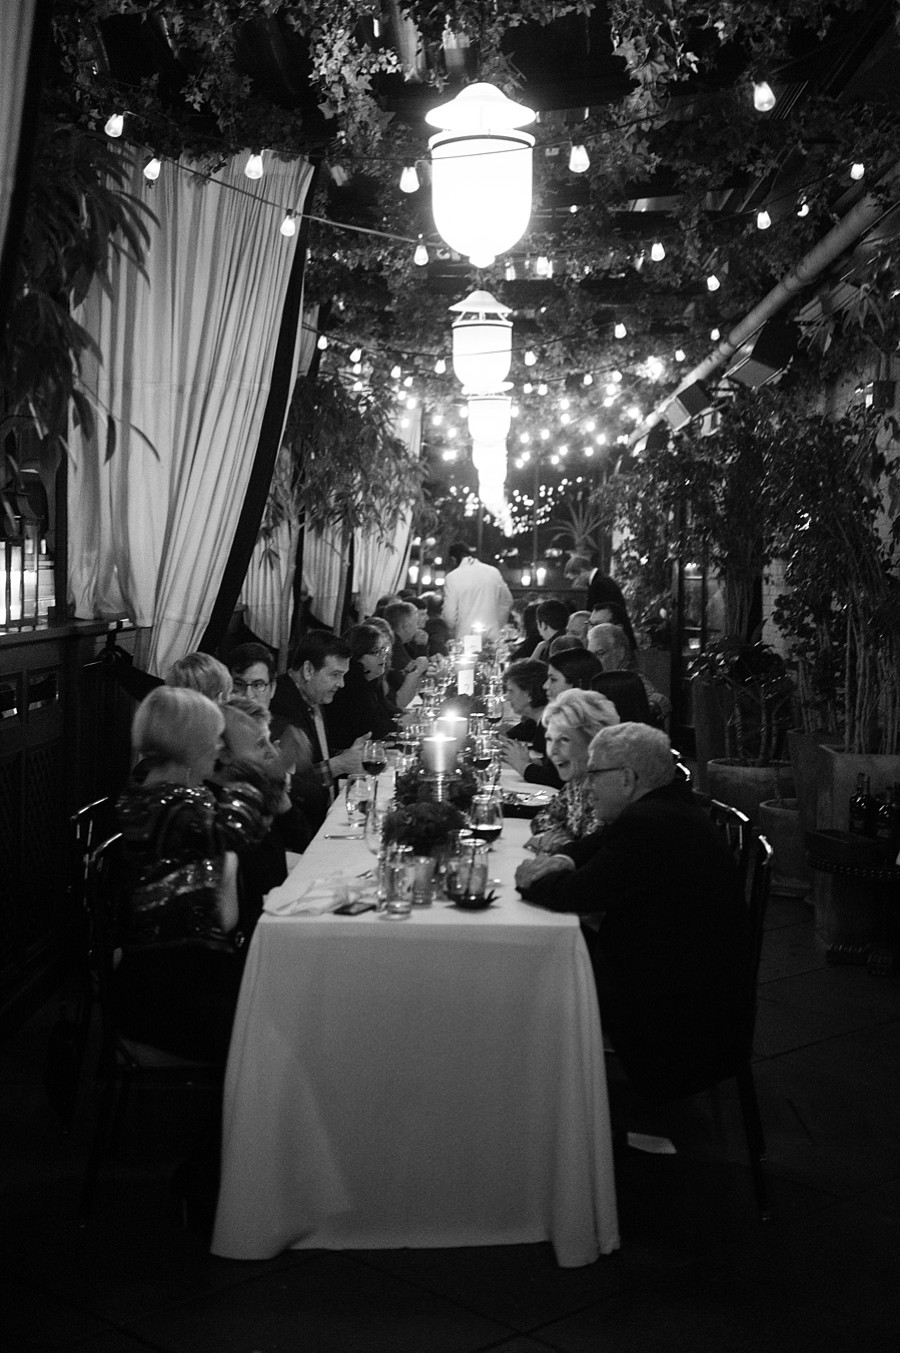 Gramercy_Park_Hotel_Wedding_NYC_FS_34.jpg